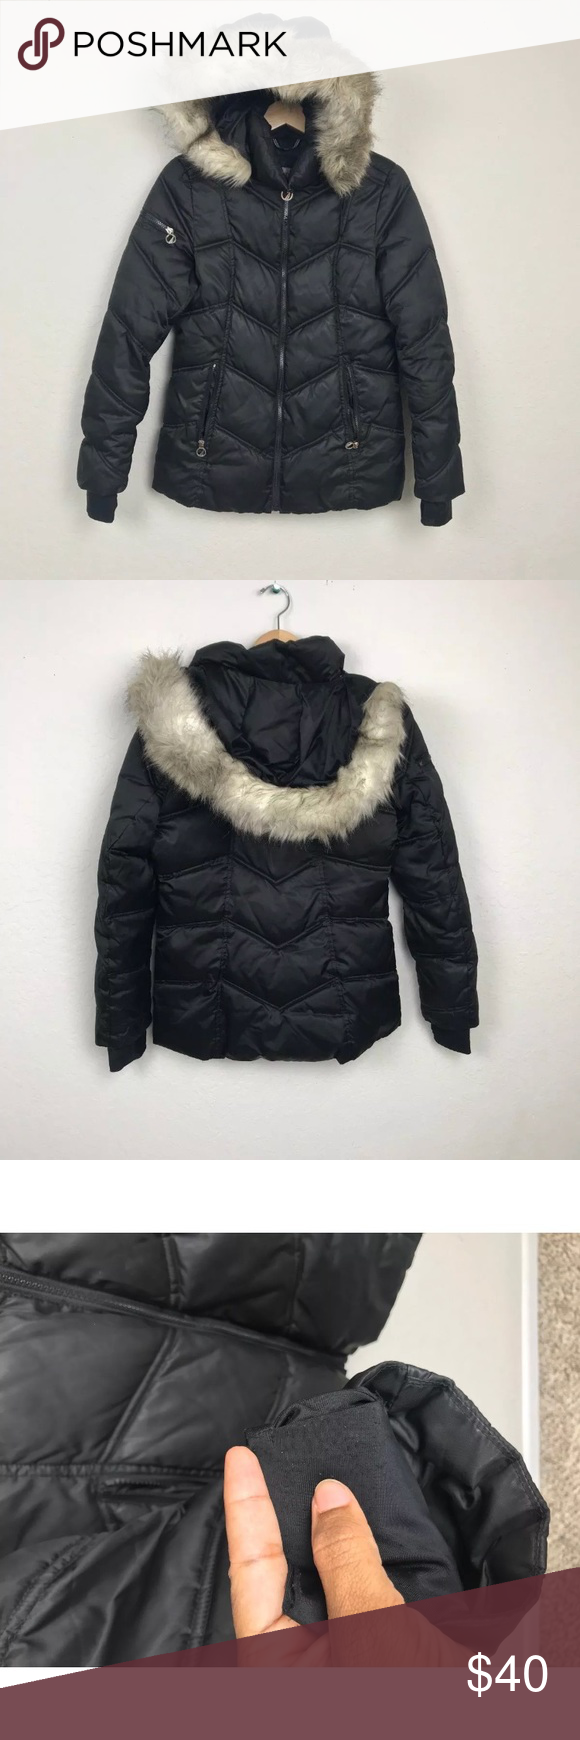 Nautica Woman Winter Coat Hoodie Puffer Sz S Winter Coats Women Winter Fashion Jackets Winter Jackets Women [ 1740 x 580 Pixel ]